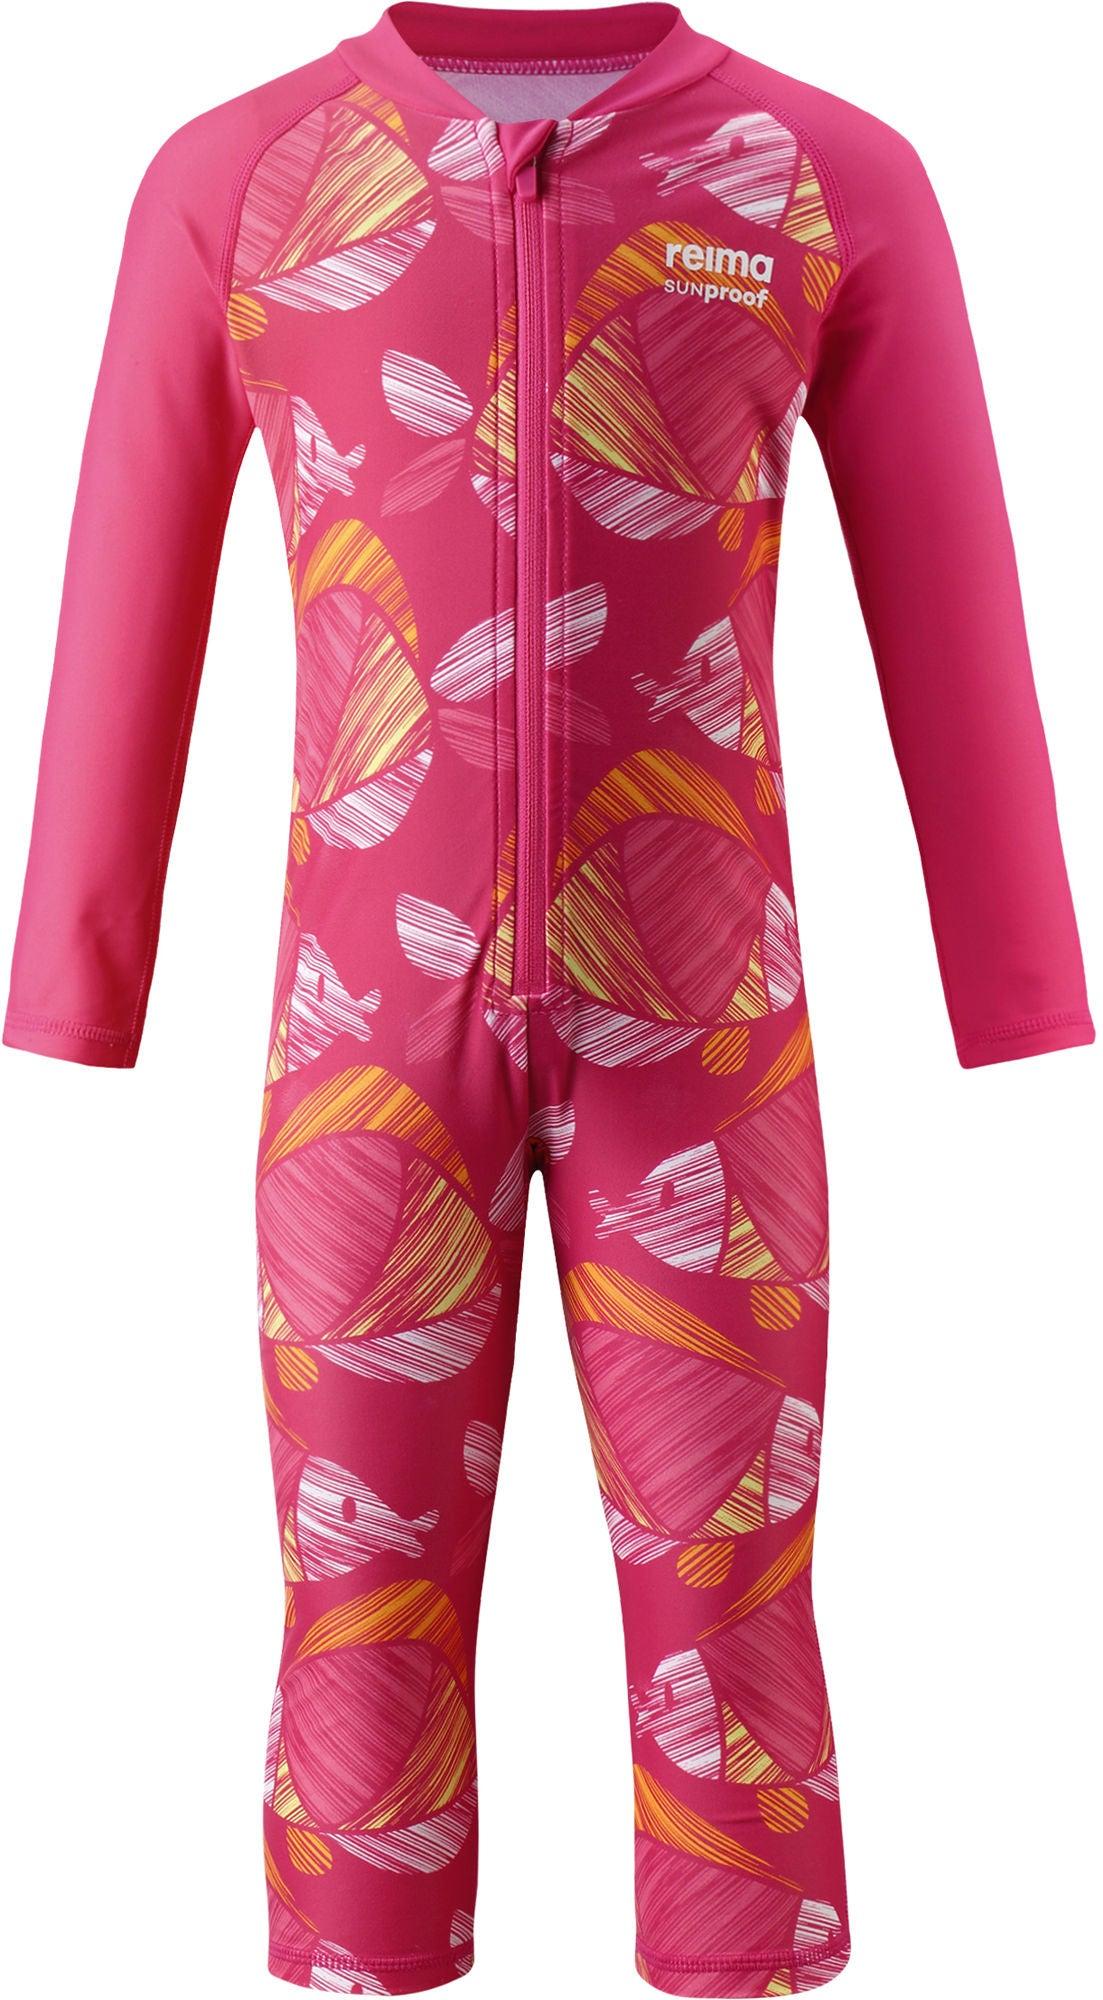 aed96896149 Køb Reima Maracuya UV-Dragt, Candy Pink   Jollyroom